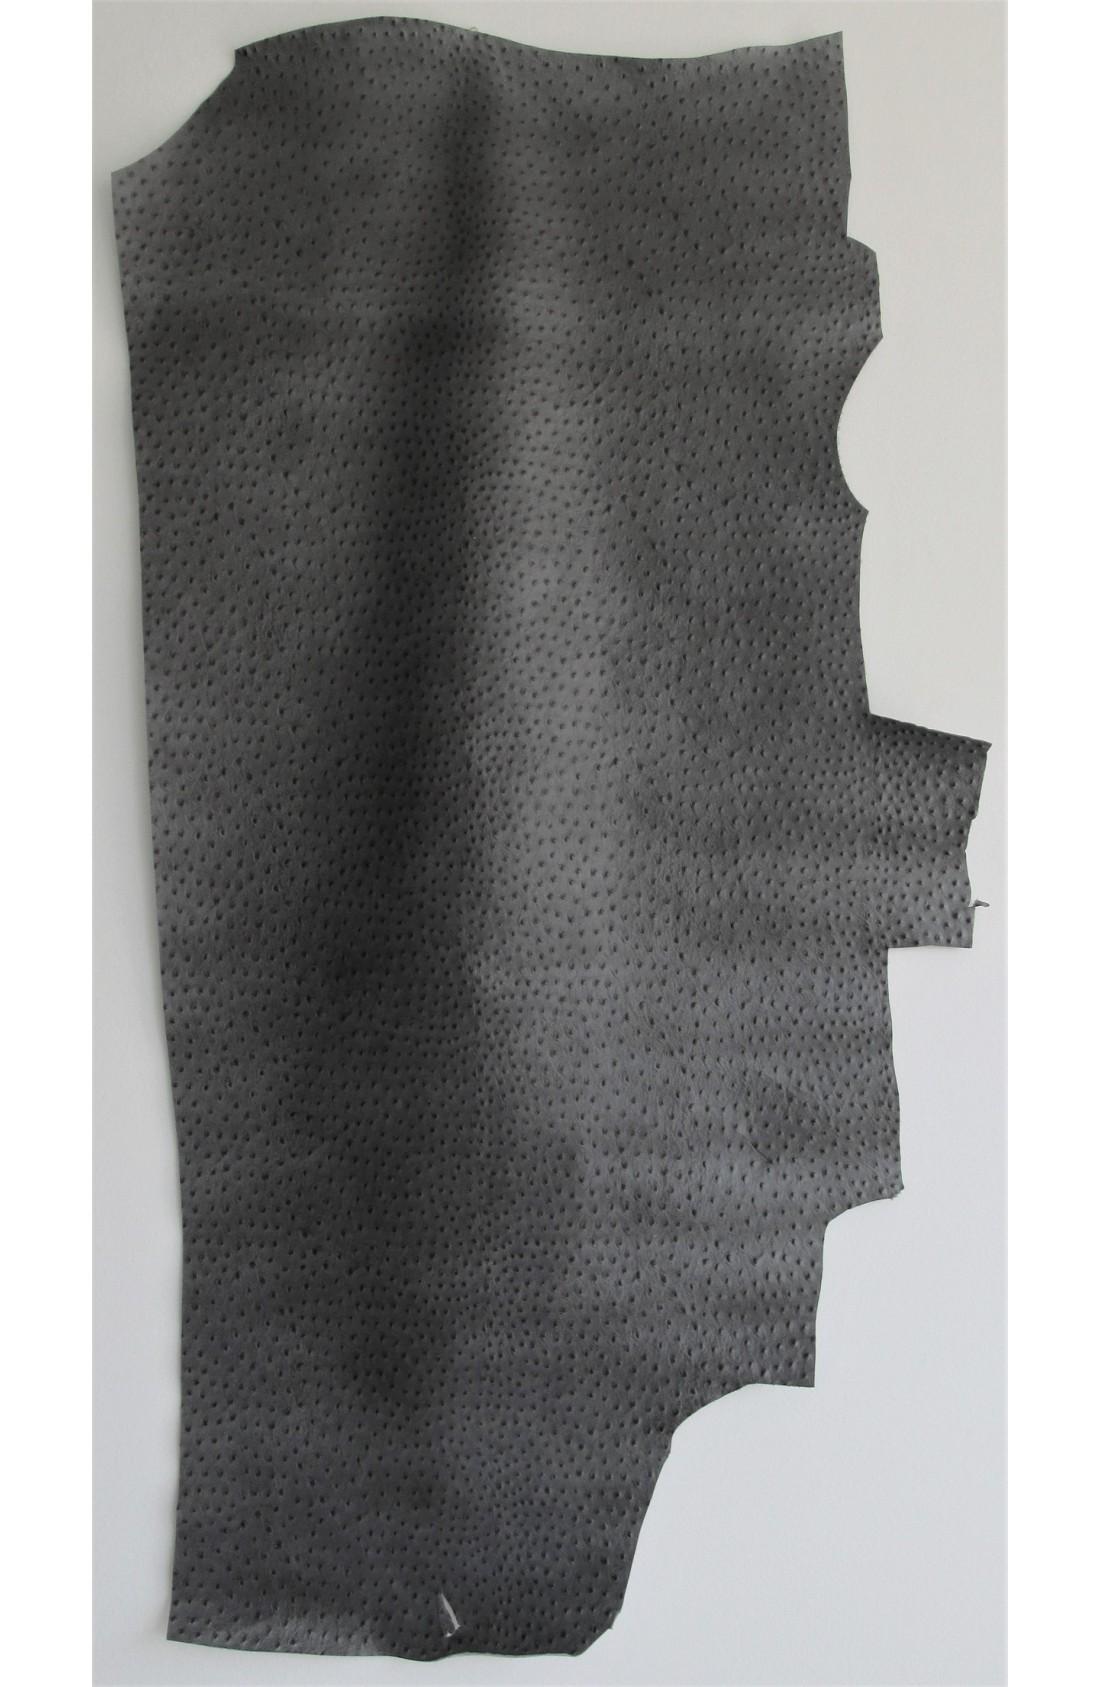 art. 65 STRUZZO SEMIOPACO var.12 grigio polvere